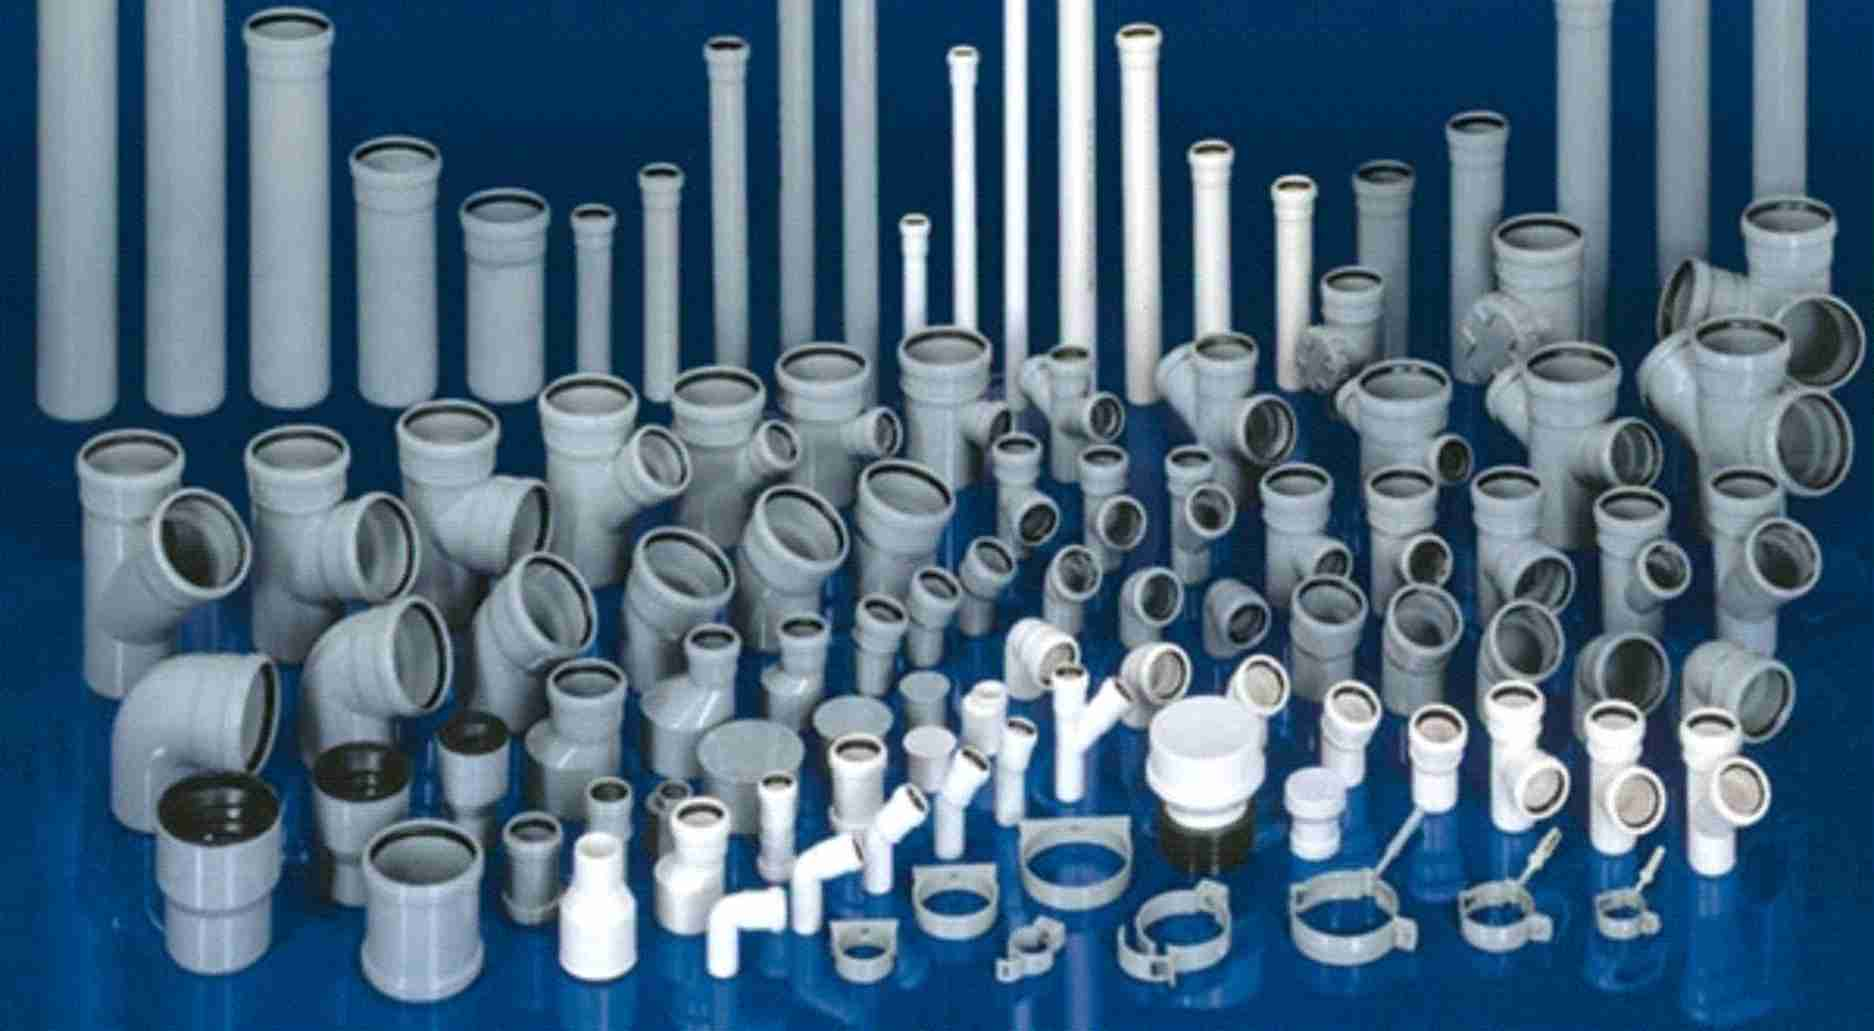 Фасонные части для канализационных труб